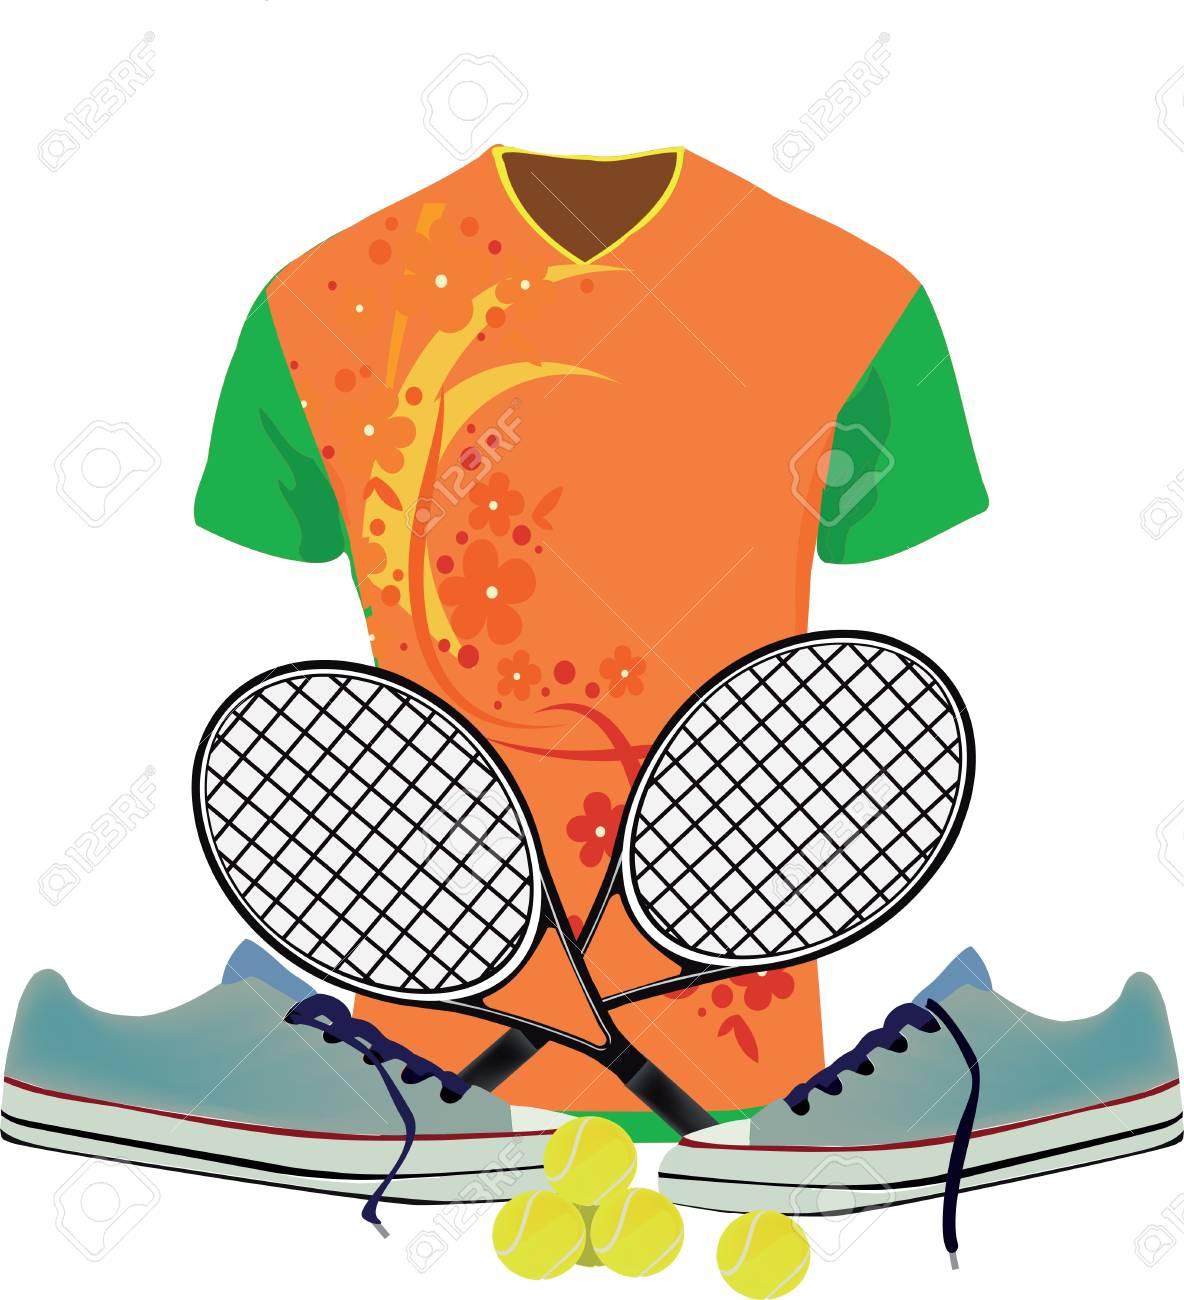 Da Abbigliamento Da Tennis Sportivo Abbigliamento Tennis Sportivo 1cluTFJK3